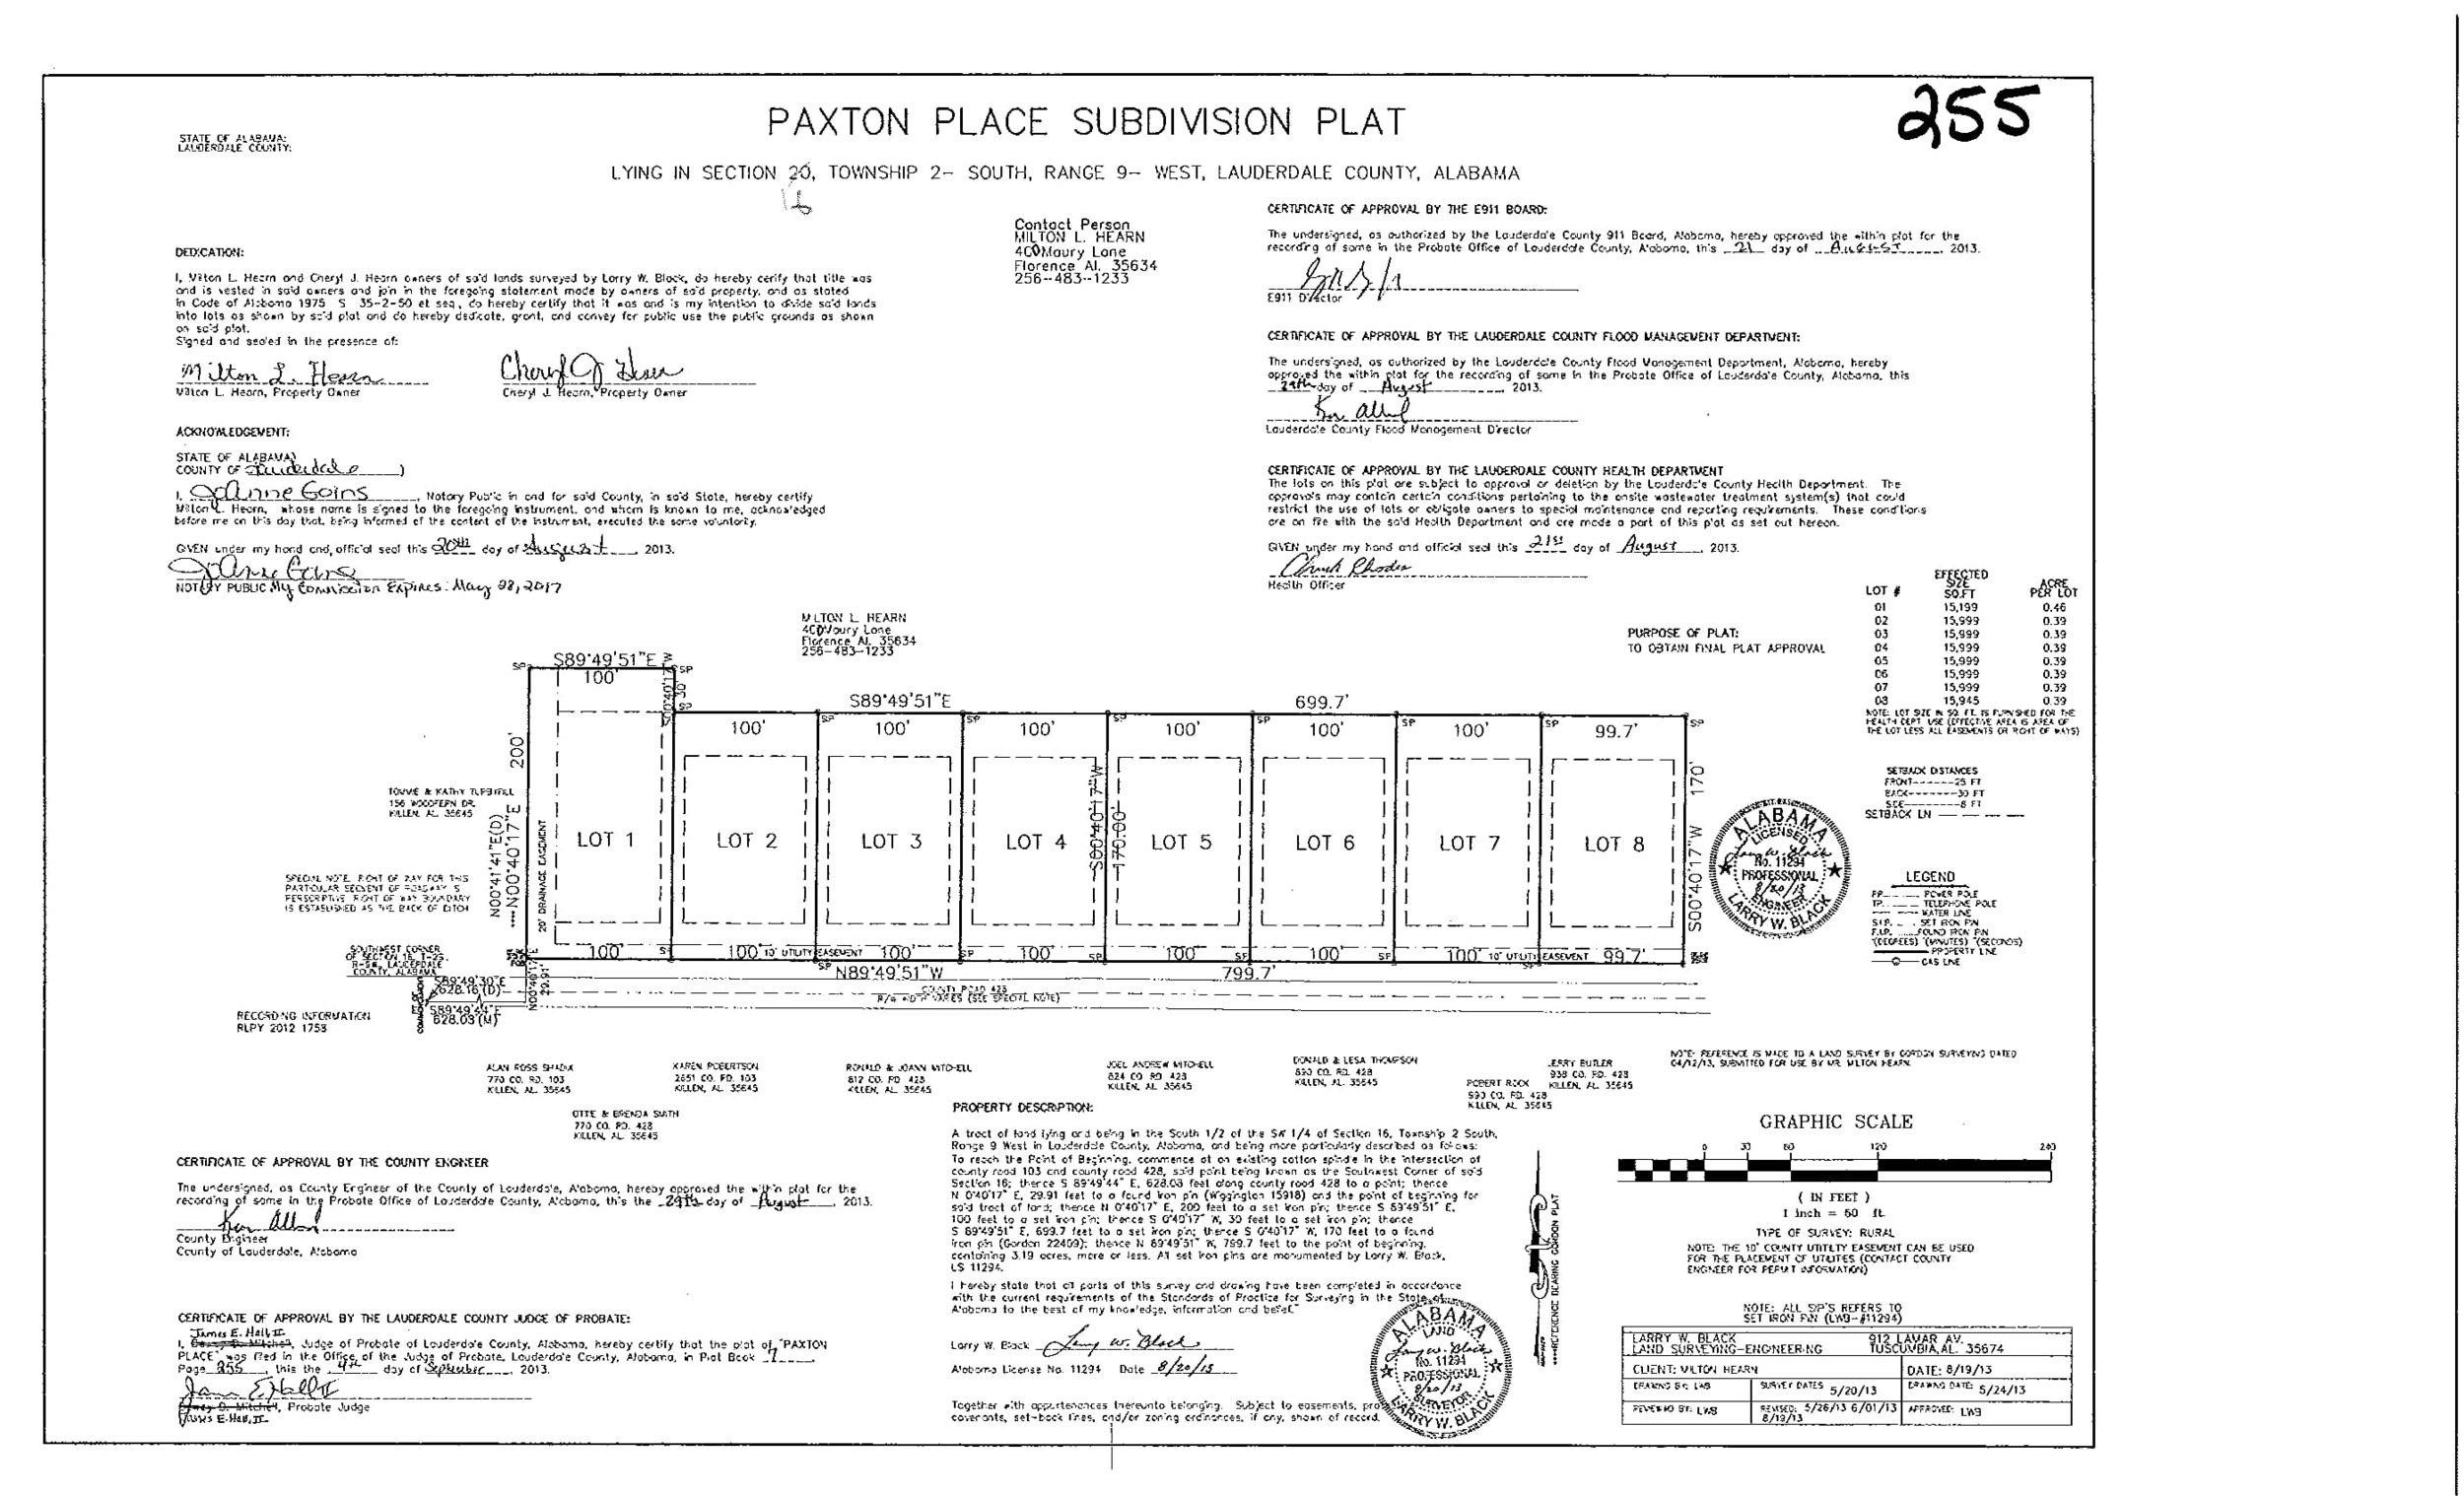 Plat-Paxton-Place-Subdivision-Plat-1.jpg